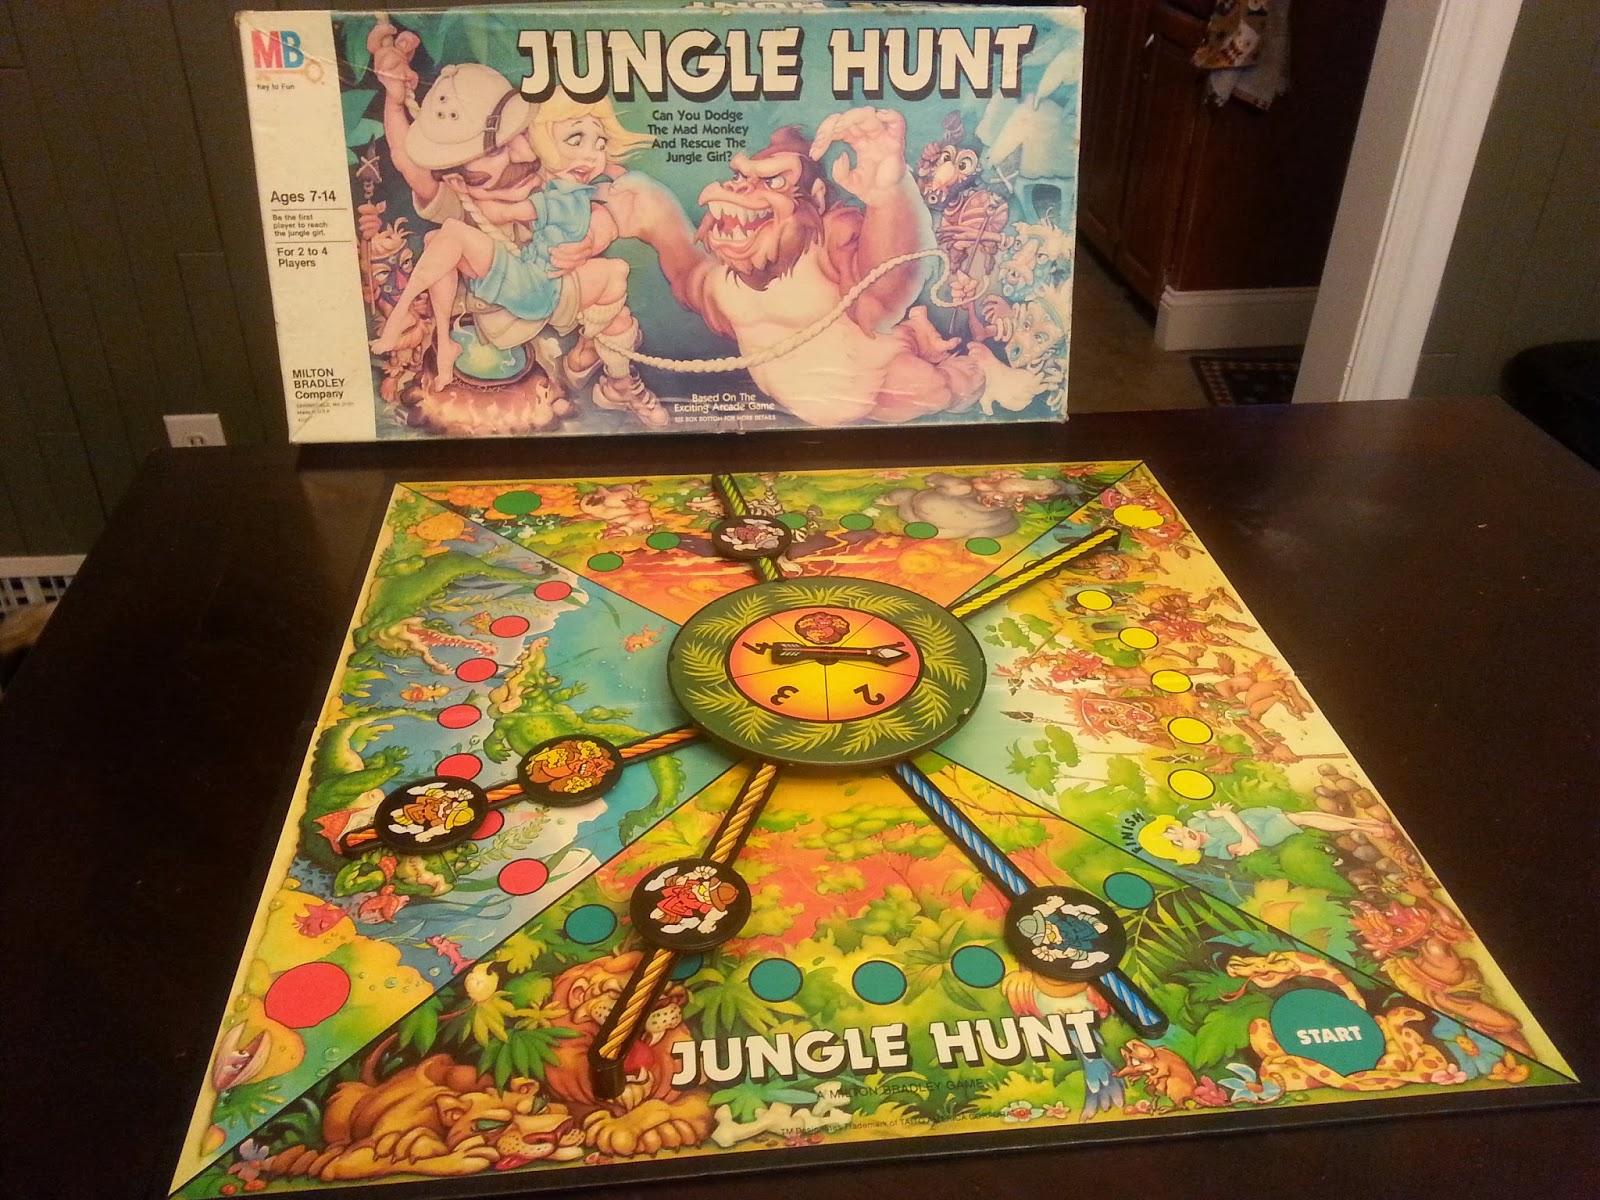 Jungle hunt arcade